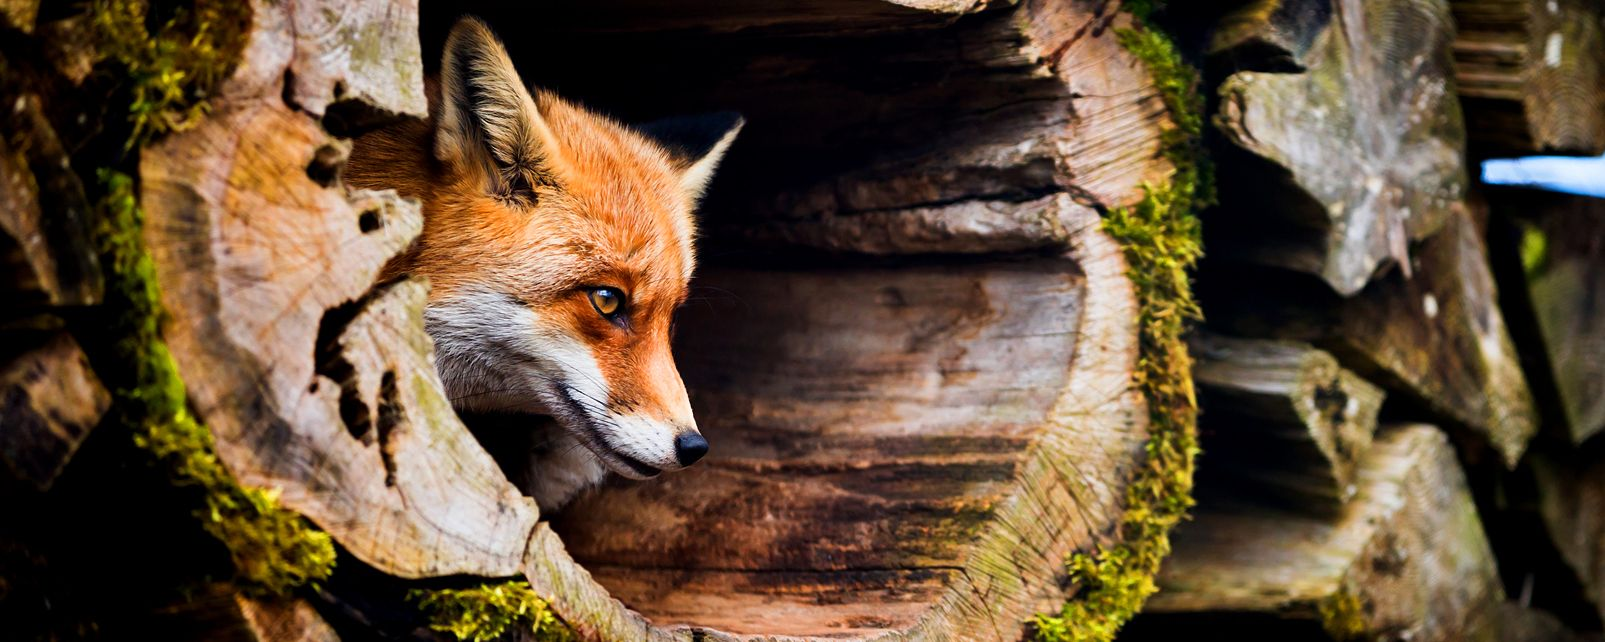 La faune , Renard, Hertfordshire, Angleterre , Royaume-Uni